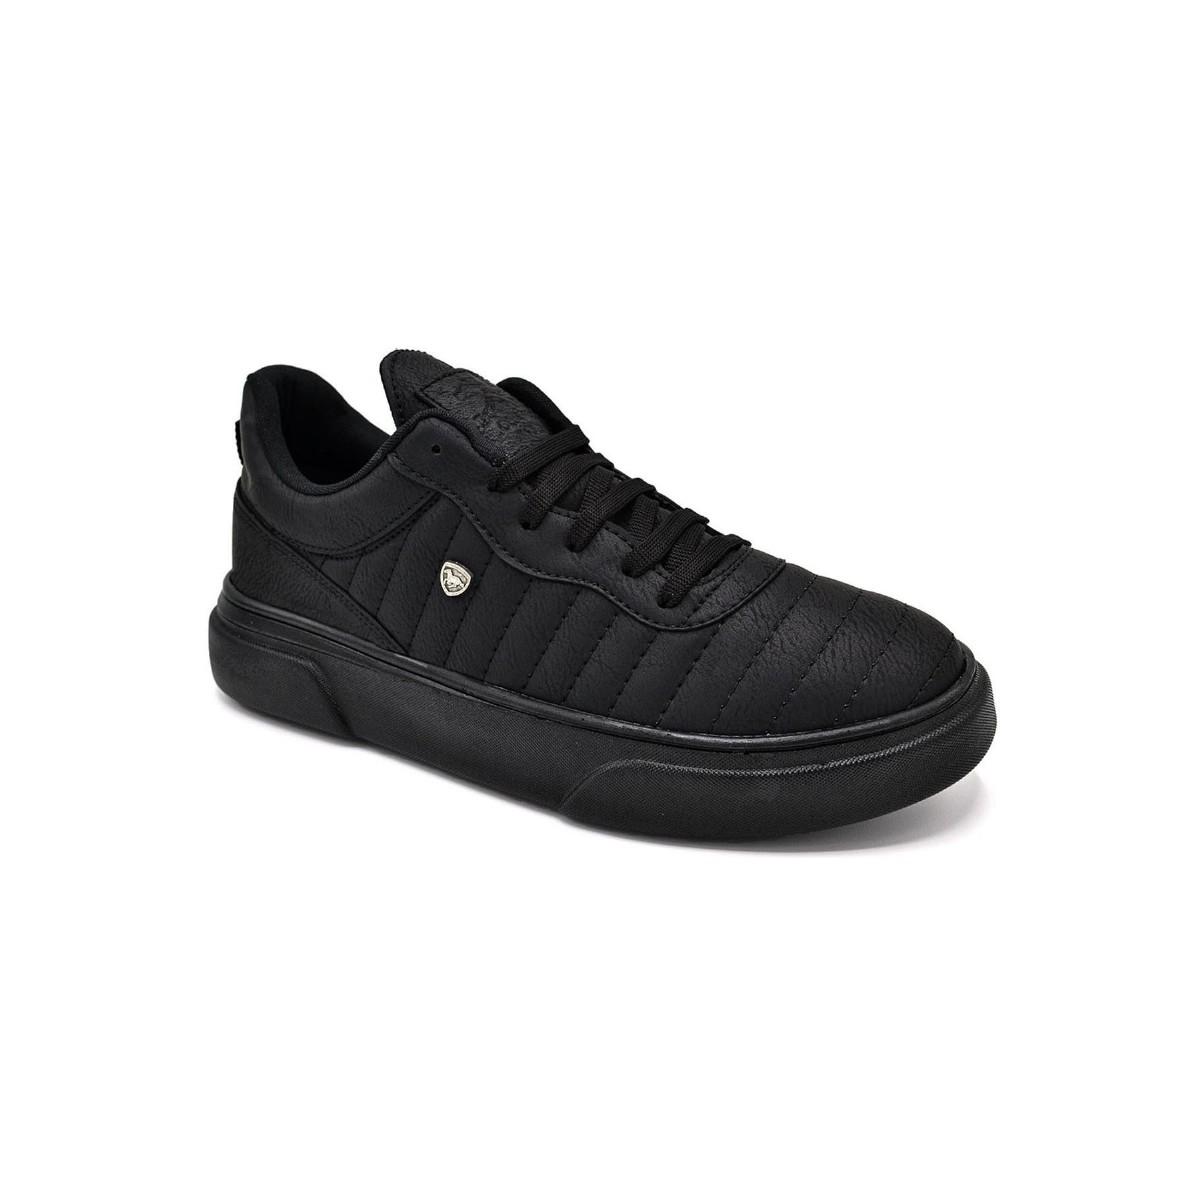 L.A. Polo 113 Siyah Siyah Erkek Spor Ayakkabı